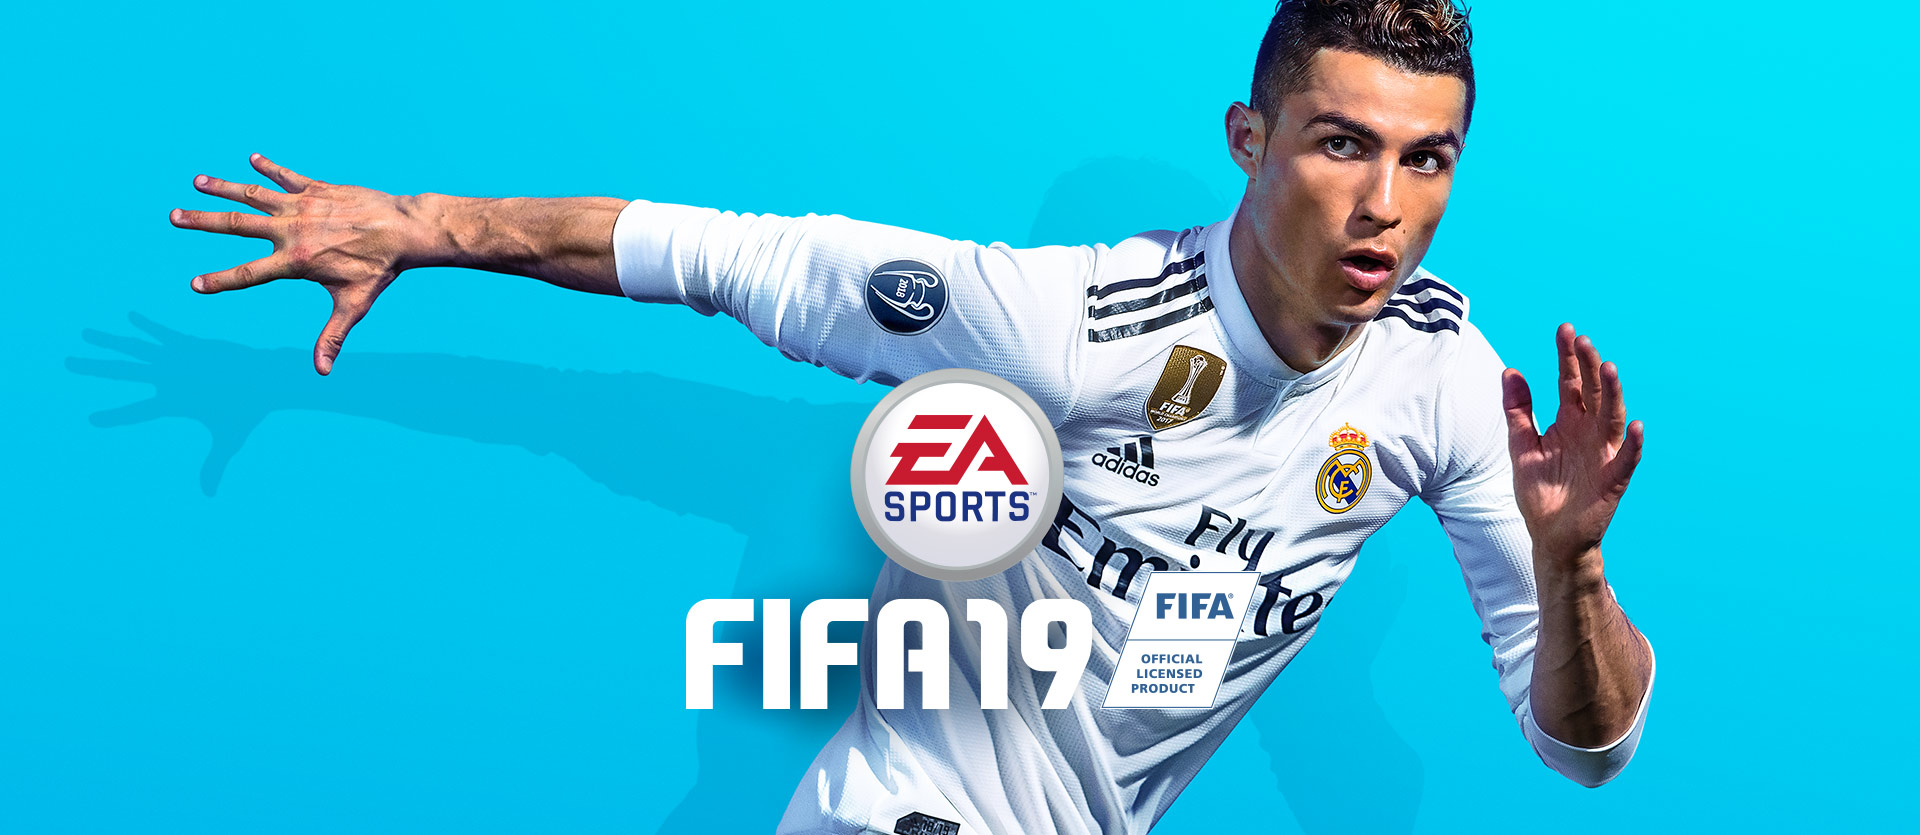 EA Sports FIFA 19, 달리기하는 크리스티아누 호날두